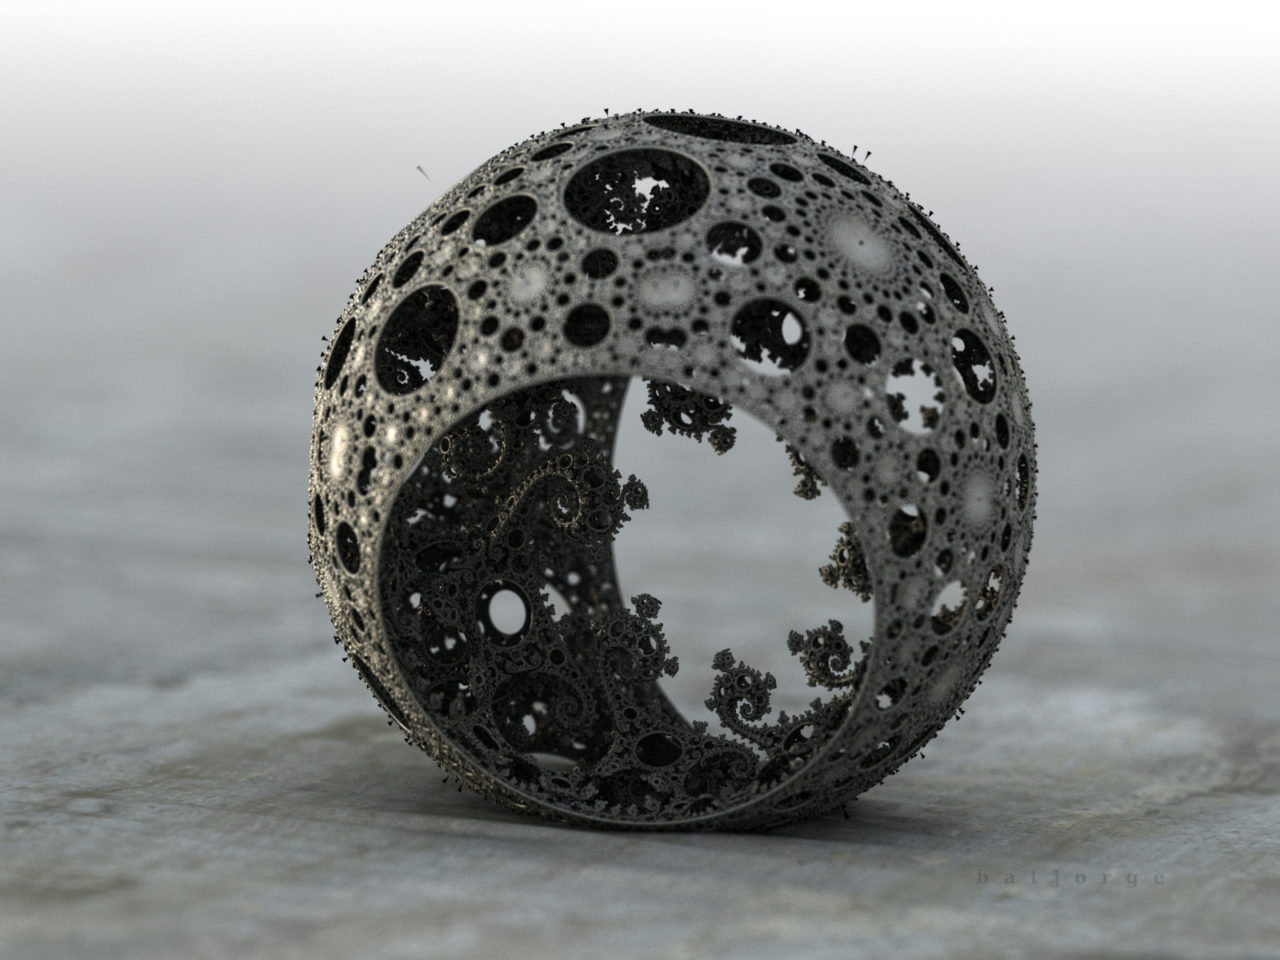 3d fractal. mandelbulb3d. kleinian sphere